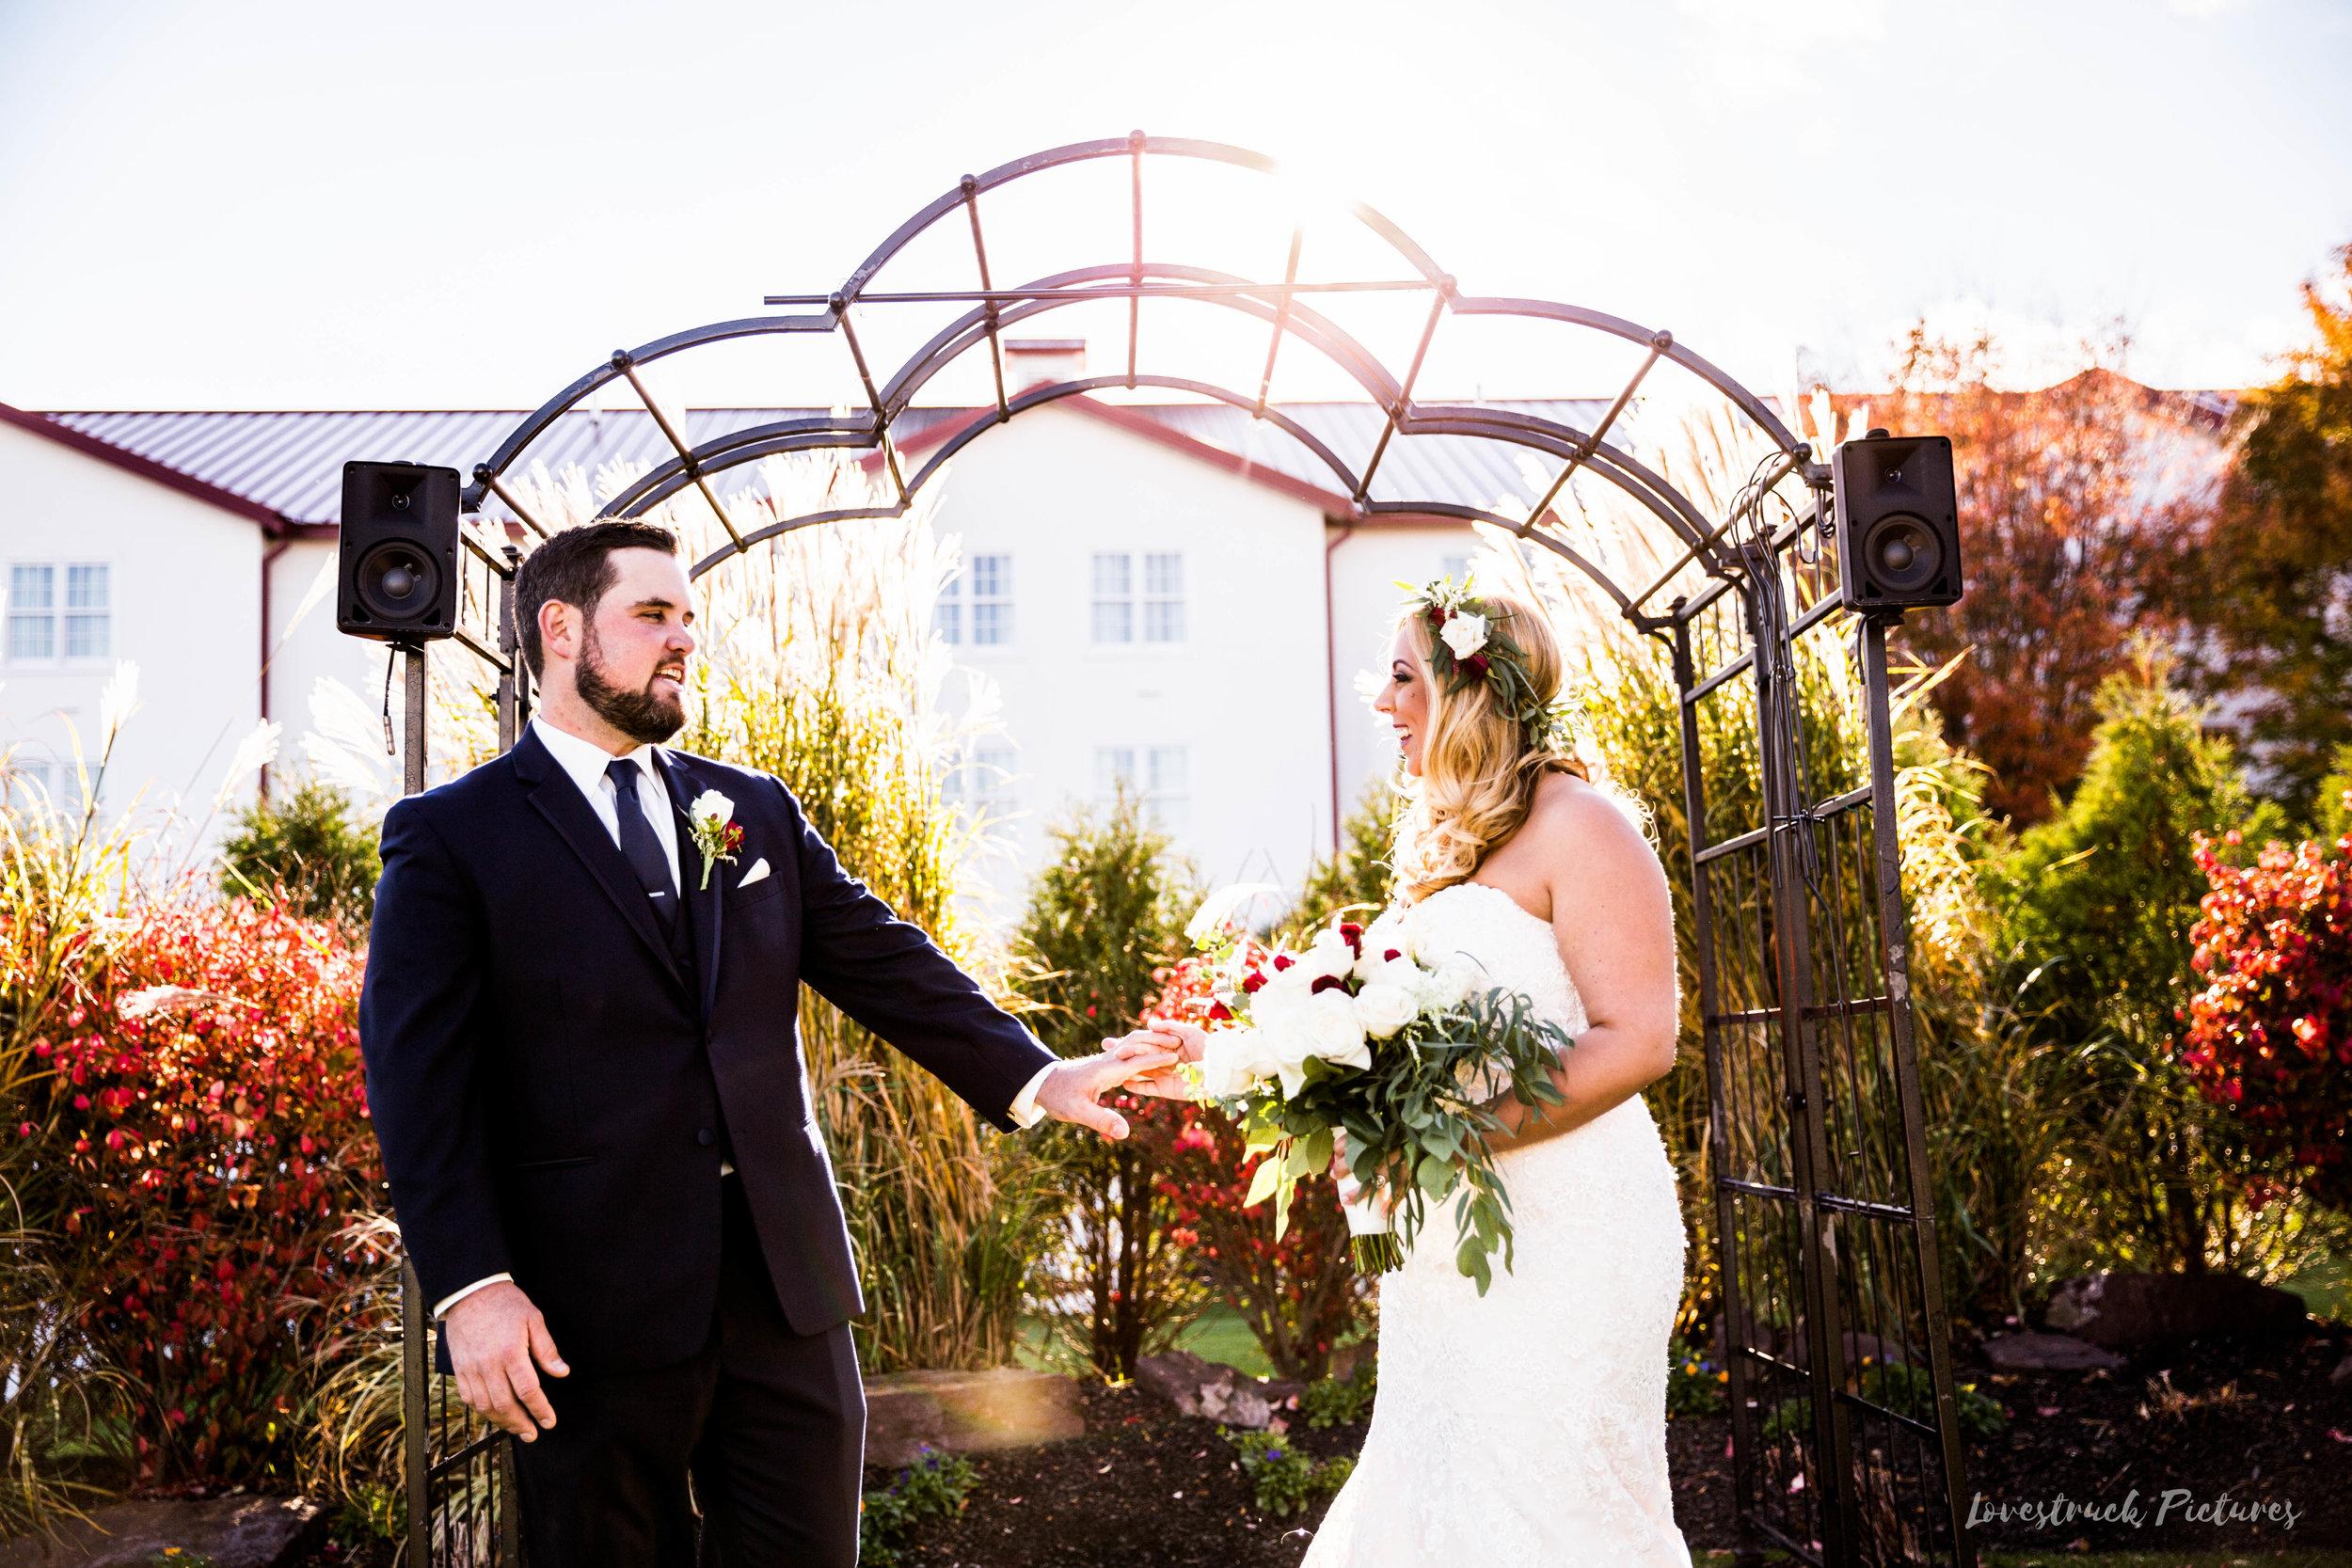 NORMANDY_FARMS_WEDDING_BLUEBELL_PA--25.jpg